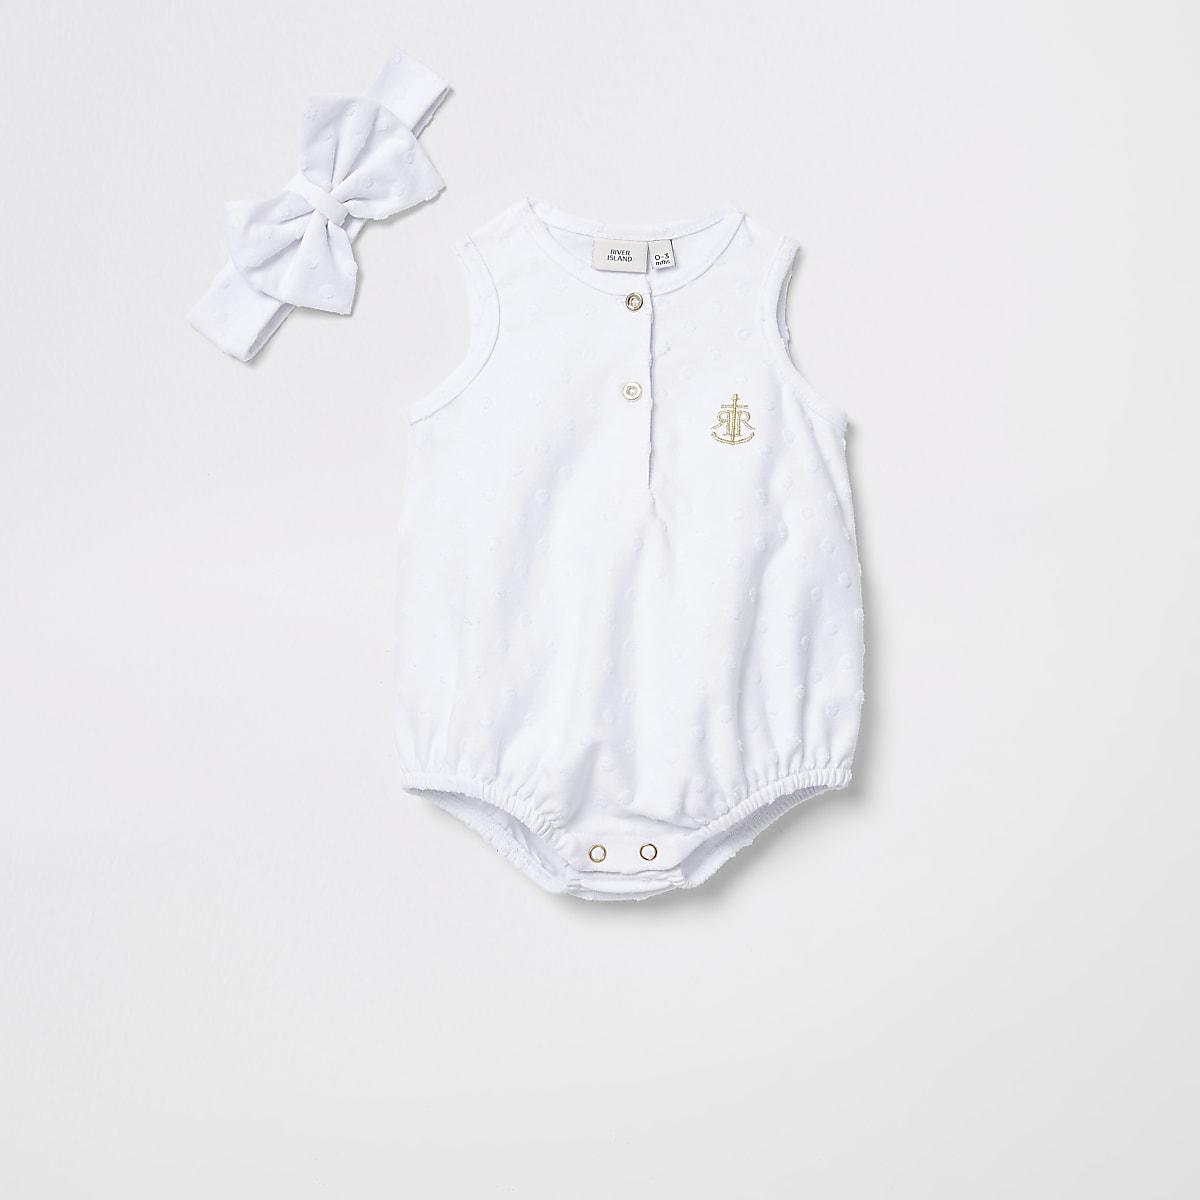 Baby white textured romper with headband